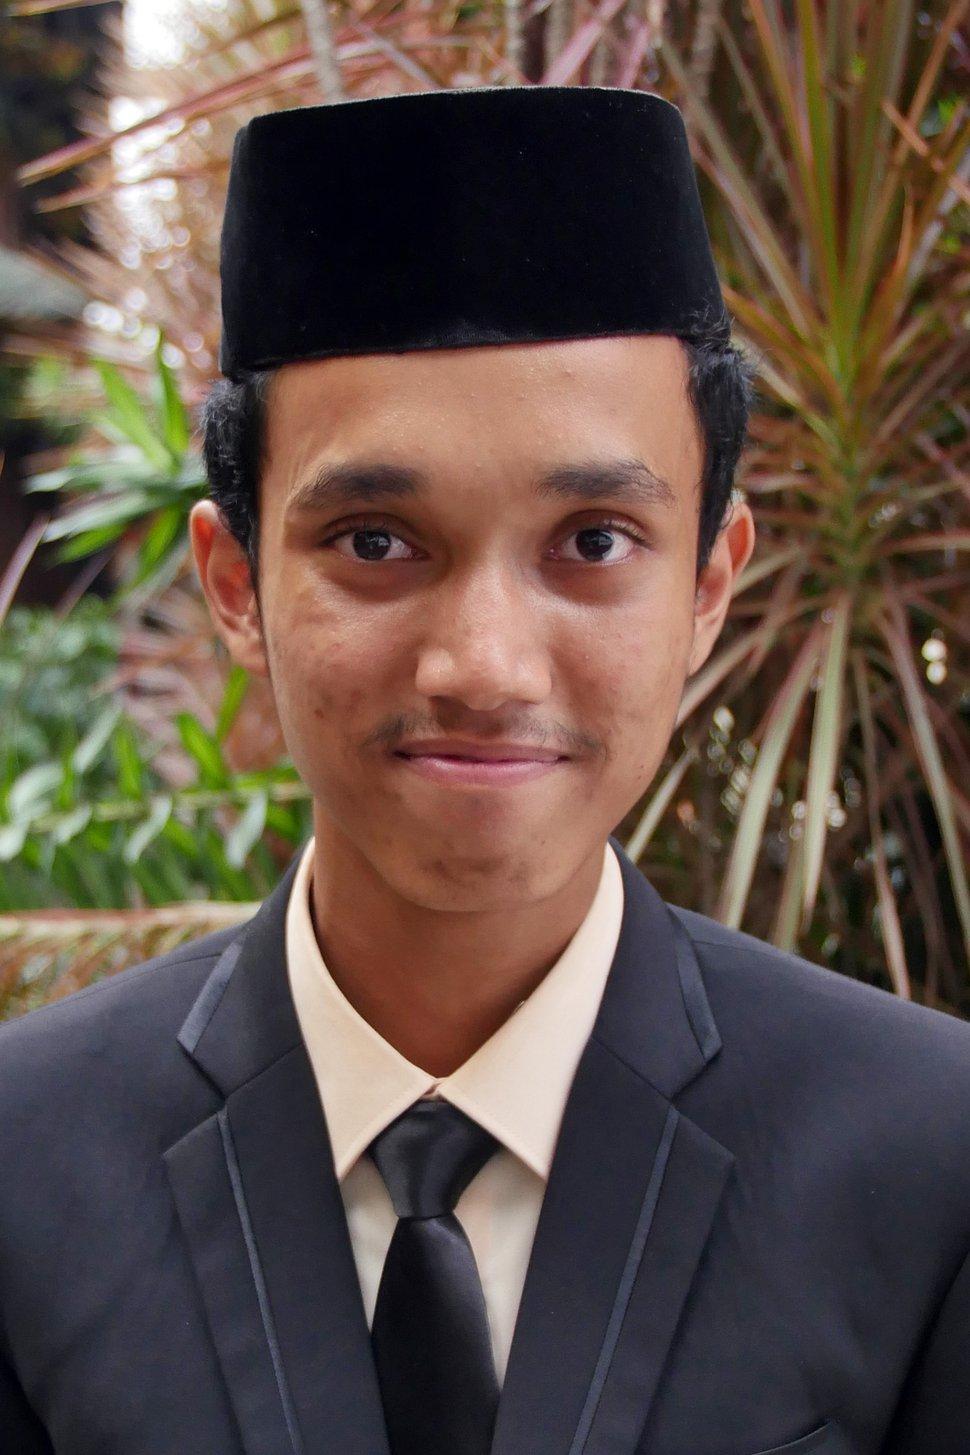 (Mike Stack | for The Salt Lake Tribune) Vaza Zuvarullutvan, 17-year-old student at the Darunnajah Islamic Boarding School in Jakarta, Indonesia, in October 2017